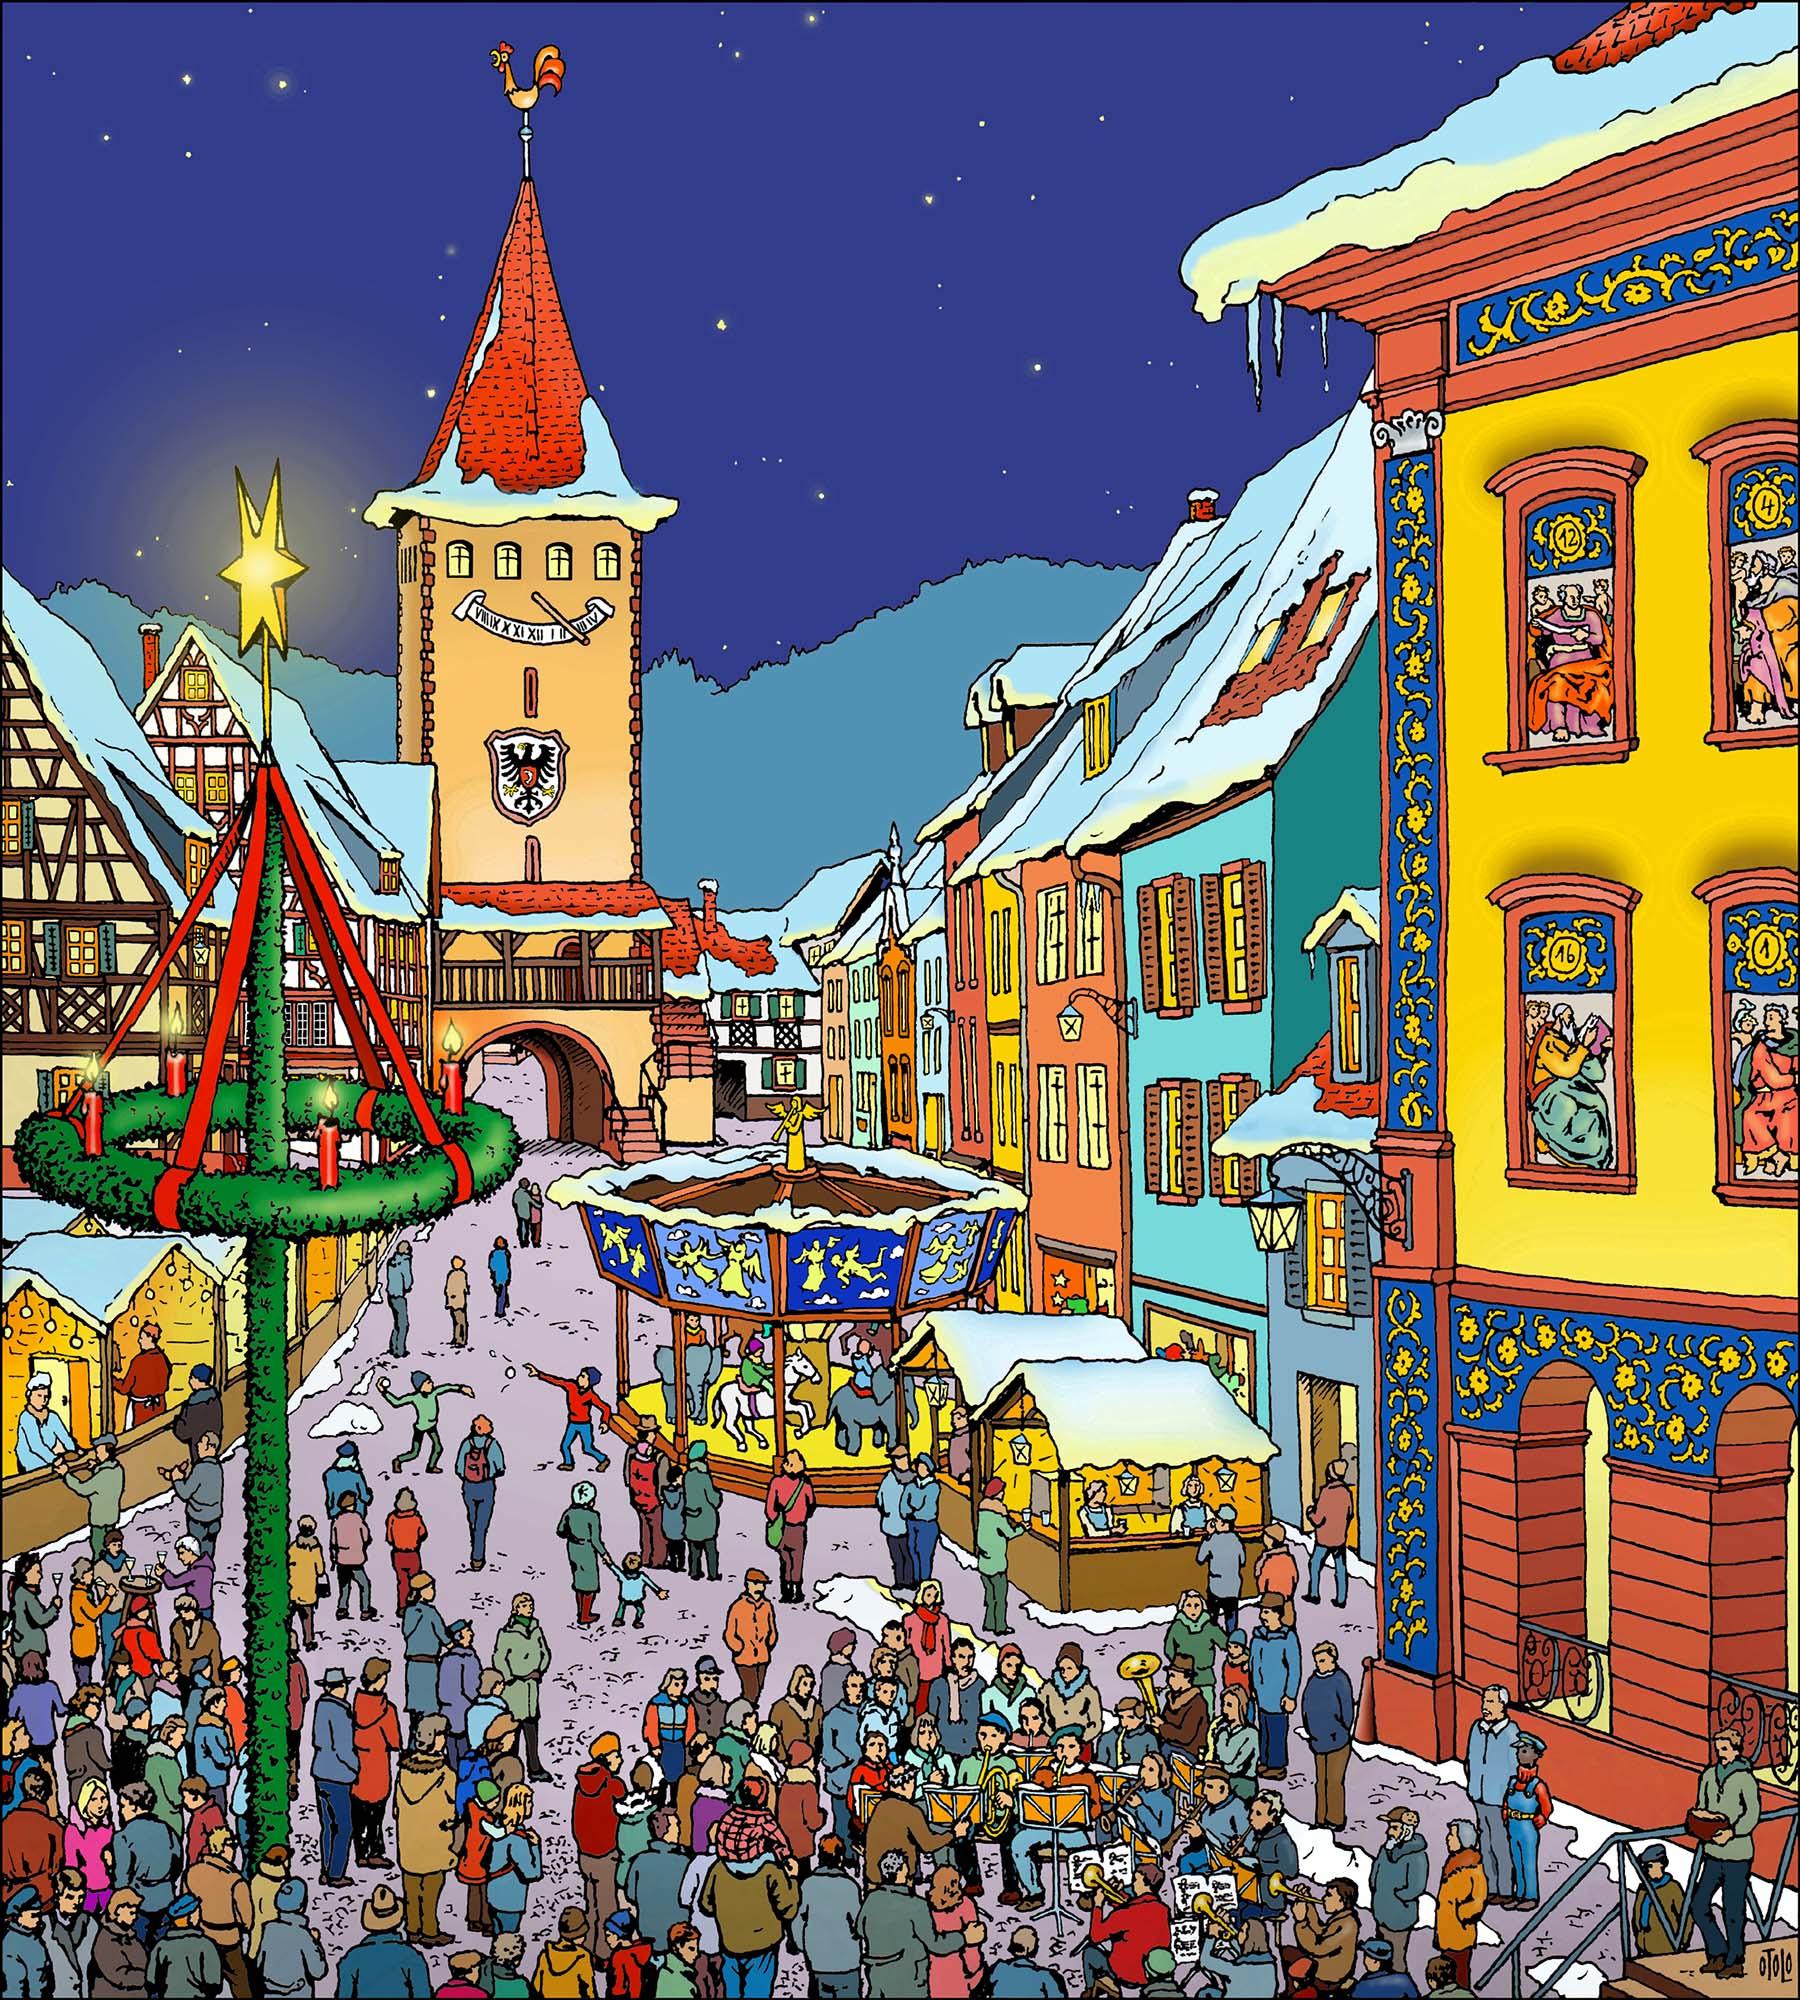 2020-11-25-GB-ARTist-Freilicht-Ausstellung-521--Otolo_GengenbacherAdventsszene